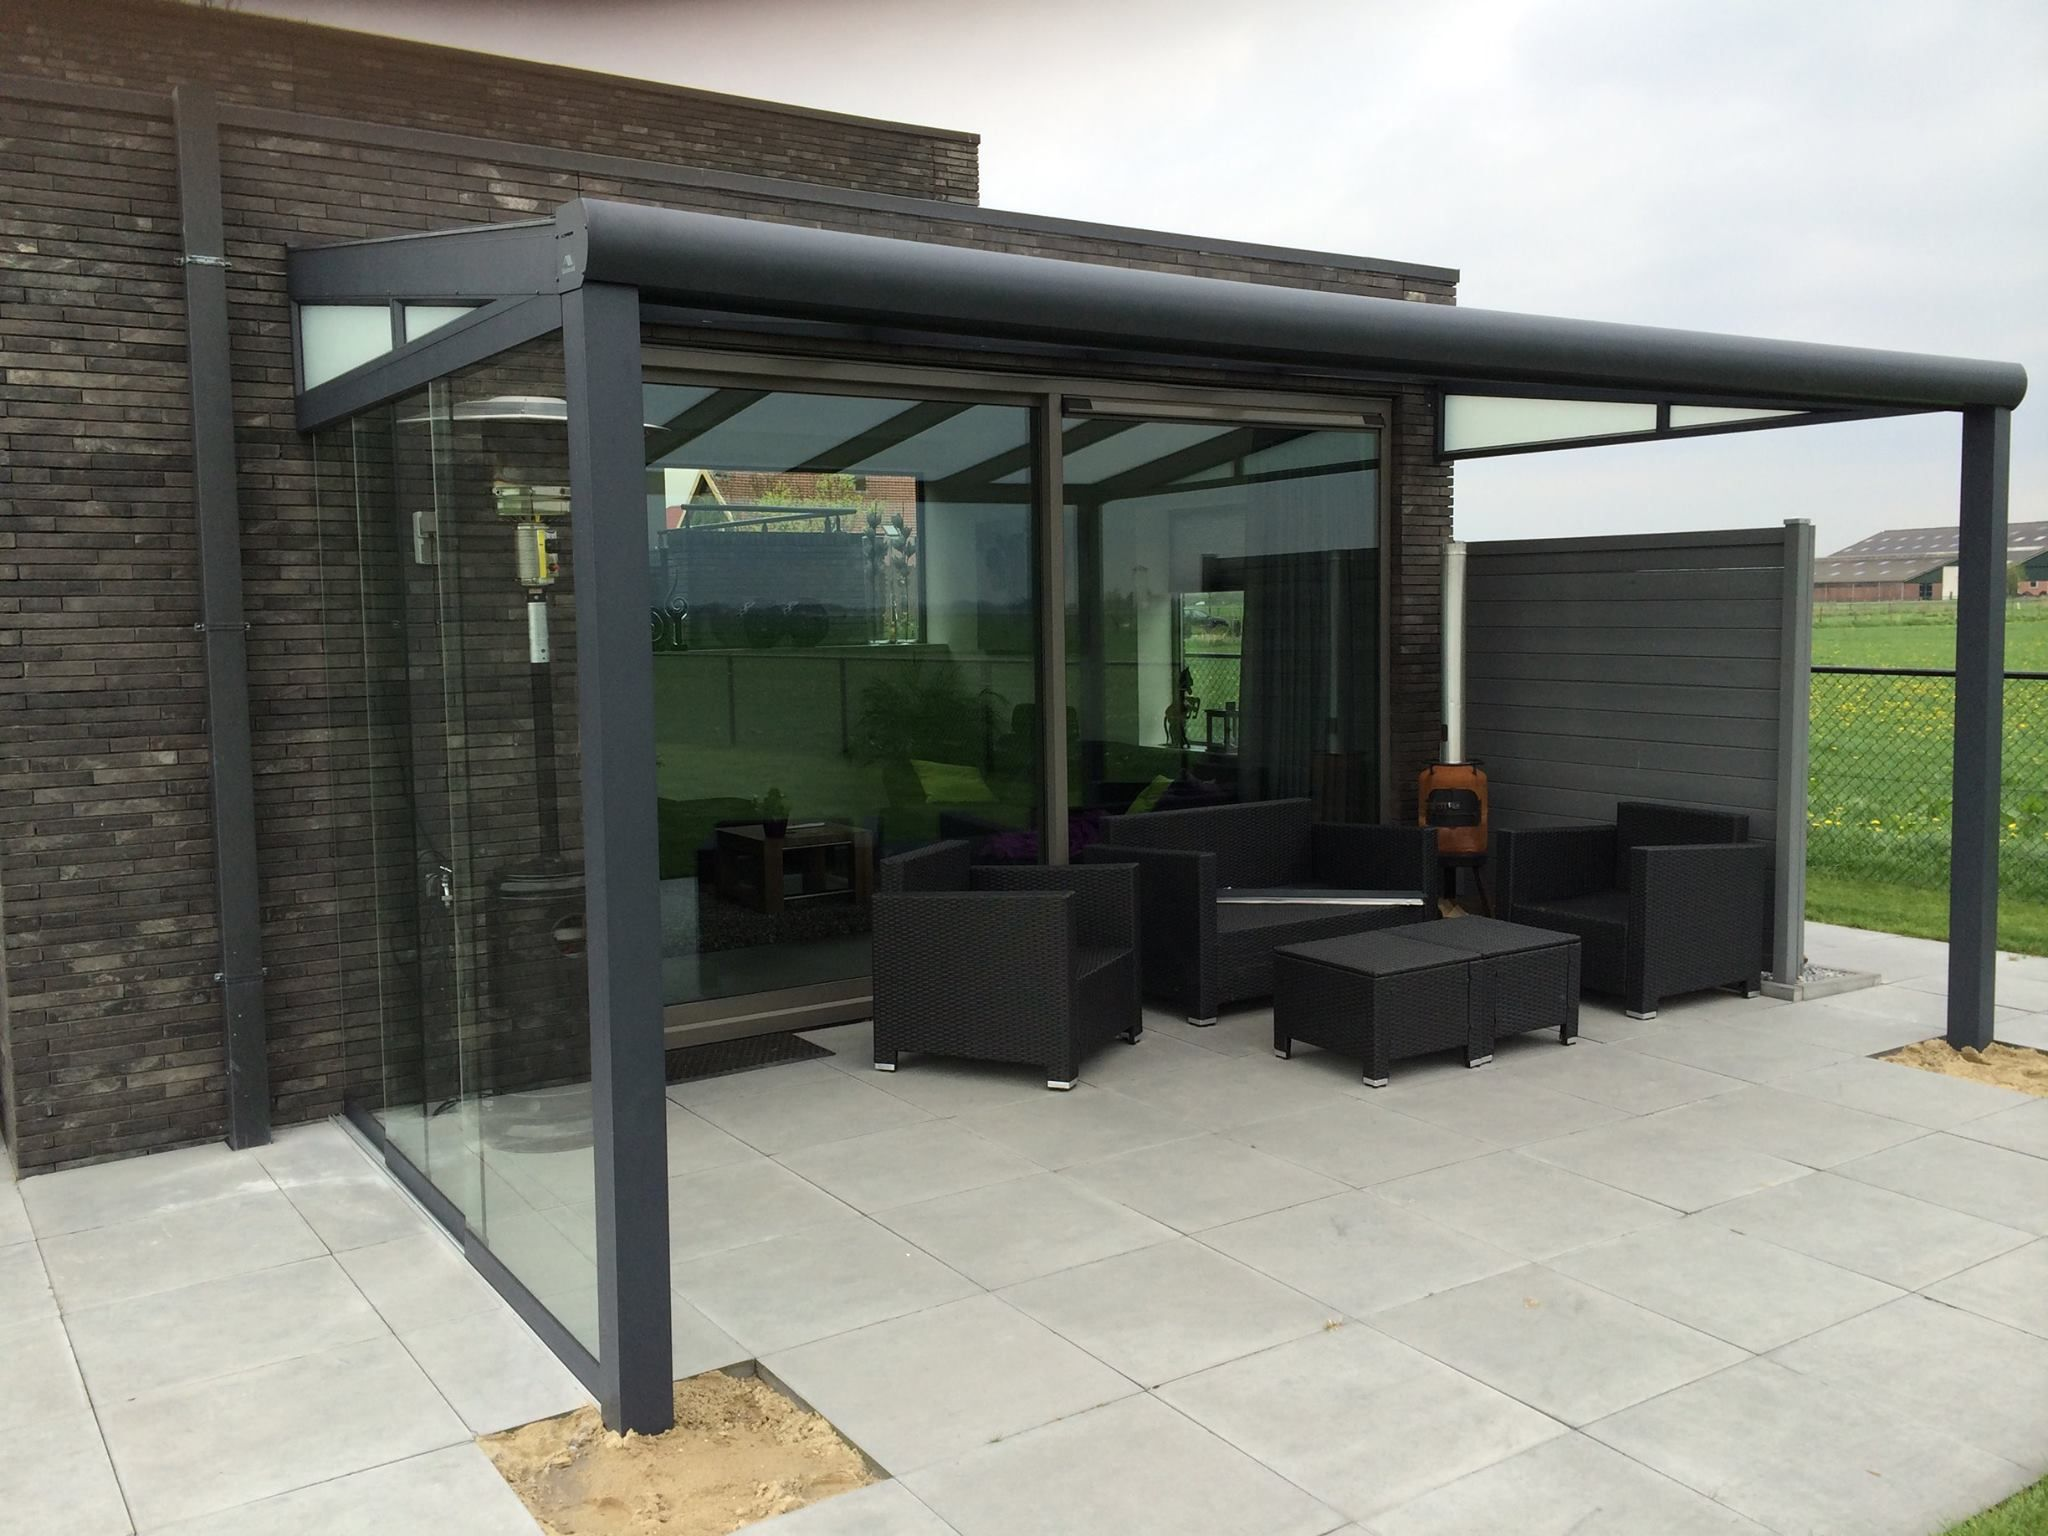 Terrassenüberdachung | EBay | Exterier Domu | Pinterest | Terrassendach,  Terrassenüberdachunu2026